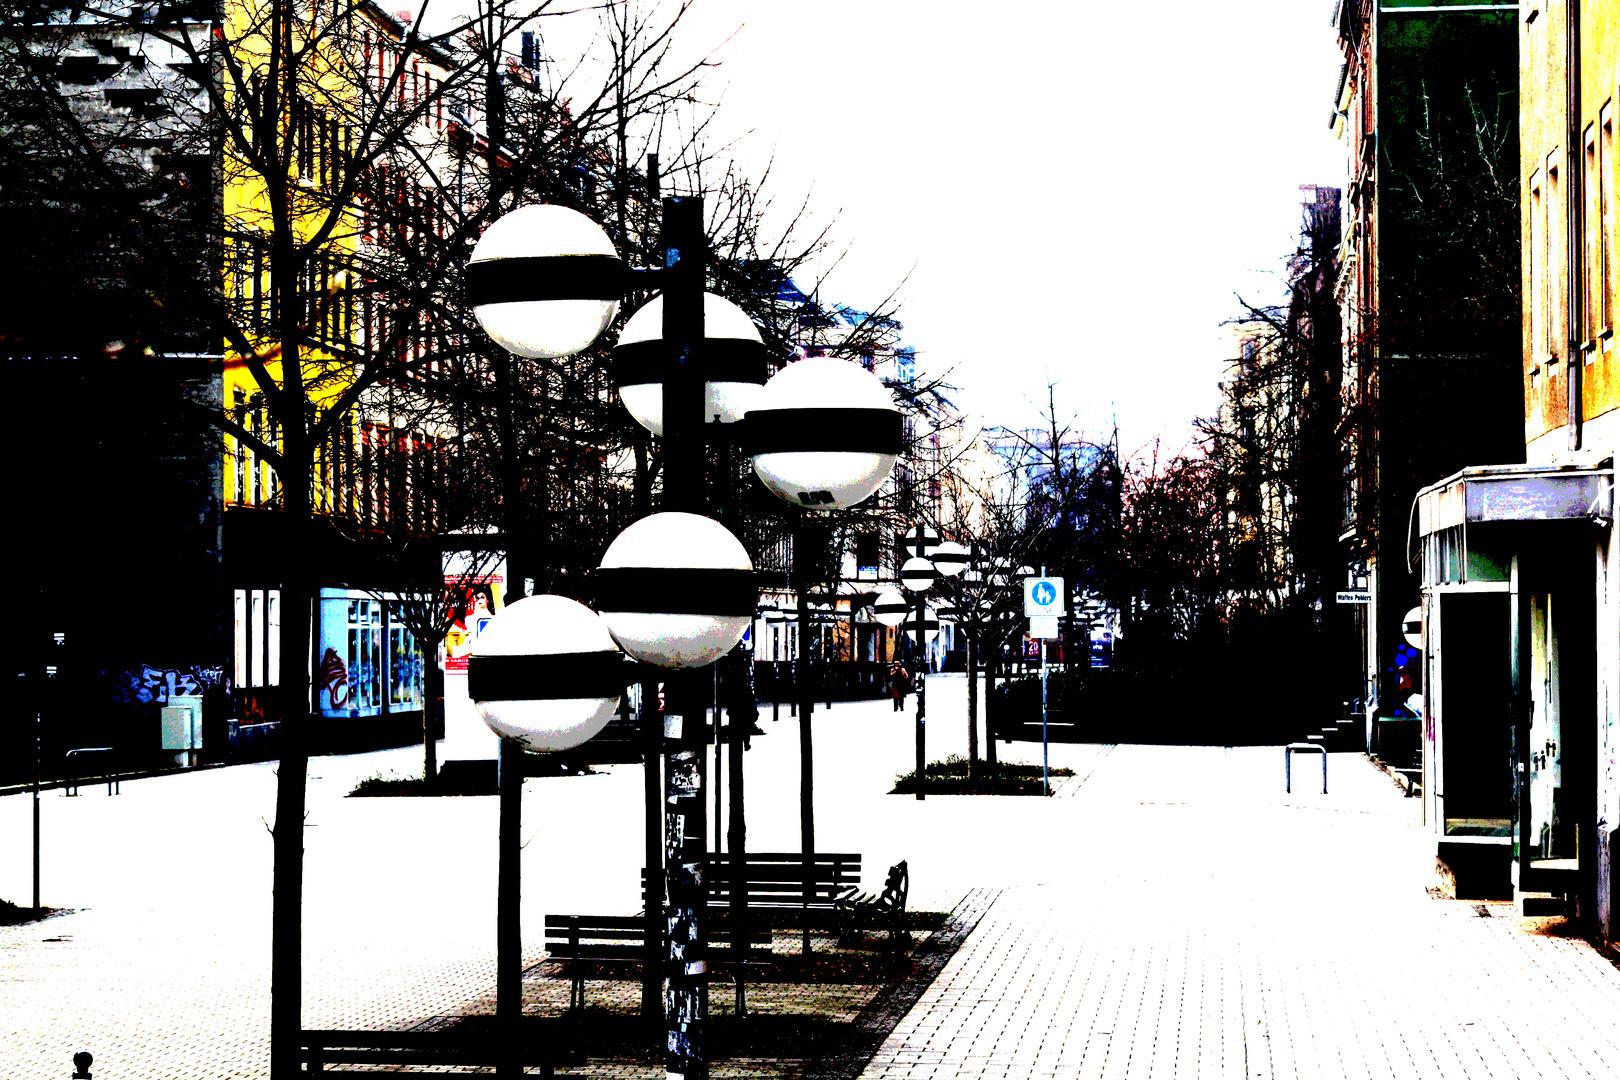 Kugelige Zeitzeugen Chemnitz